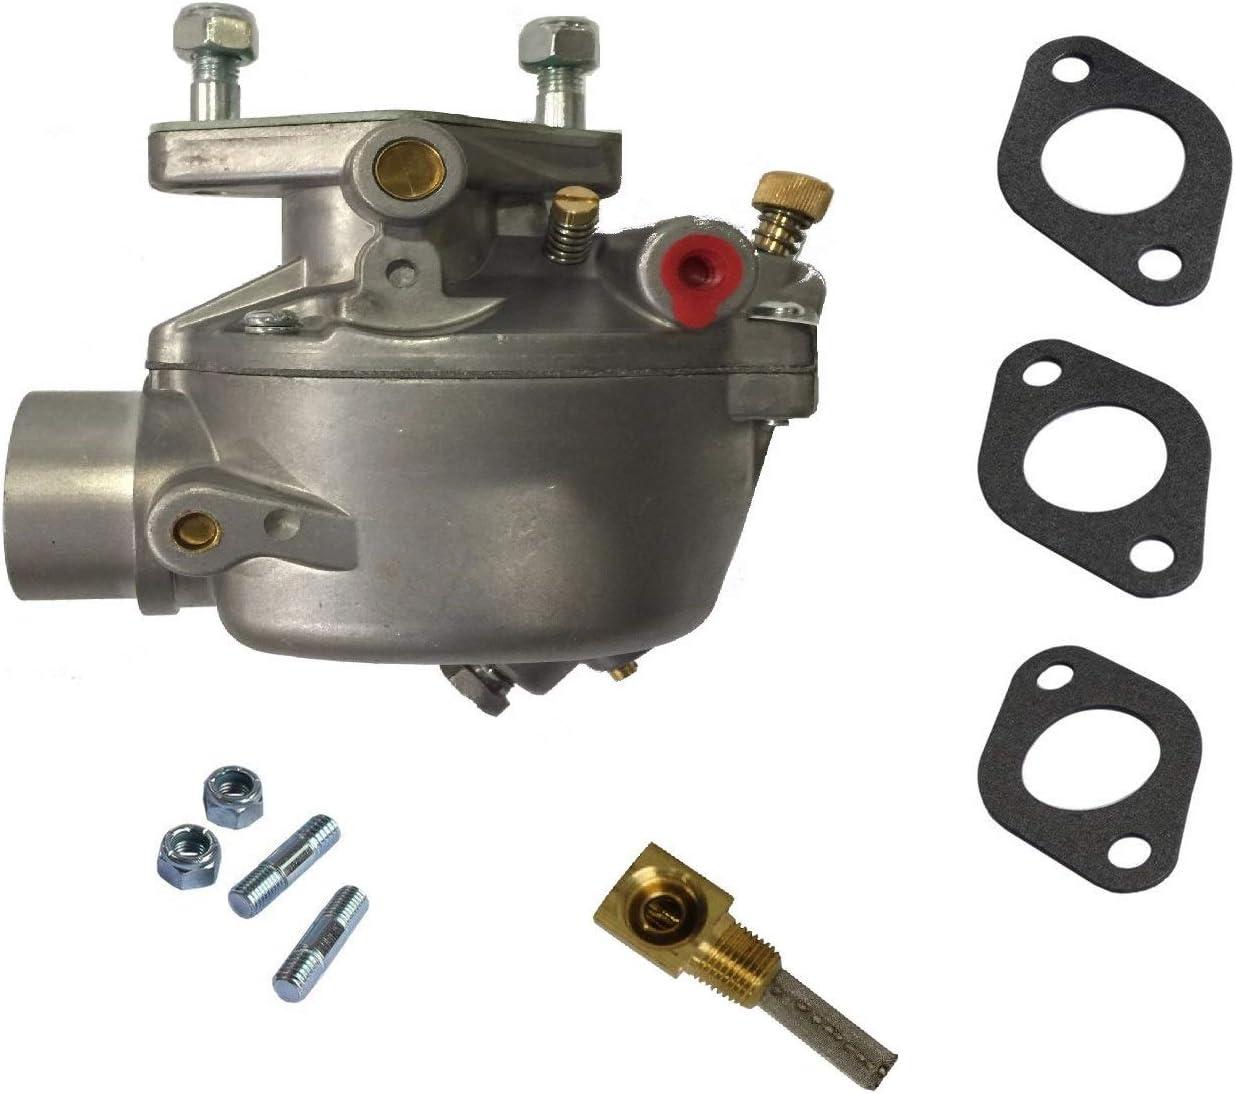 Radracing 8N9510C Carburetor Replacement Compatible Tractor 2N 8N 9N Marvel Schebler Heavy Duty TSX33 TSX241A TSX241B TSX241C 13876 0-13876 B3NN9510A 9N9510A